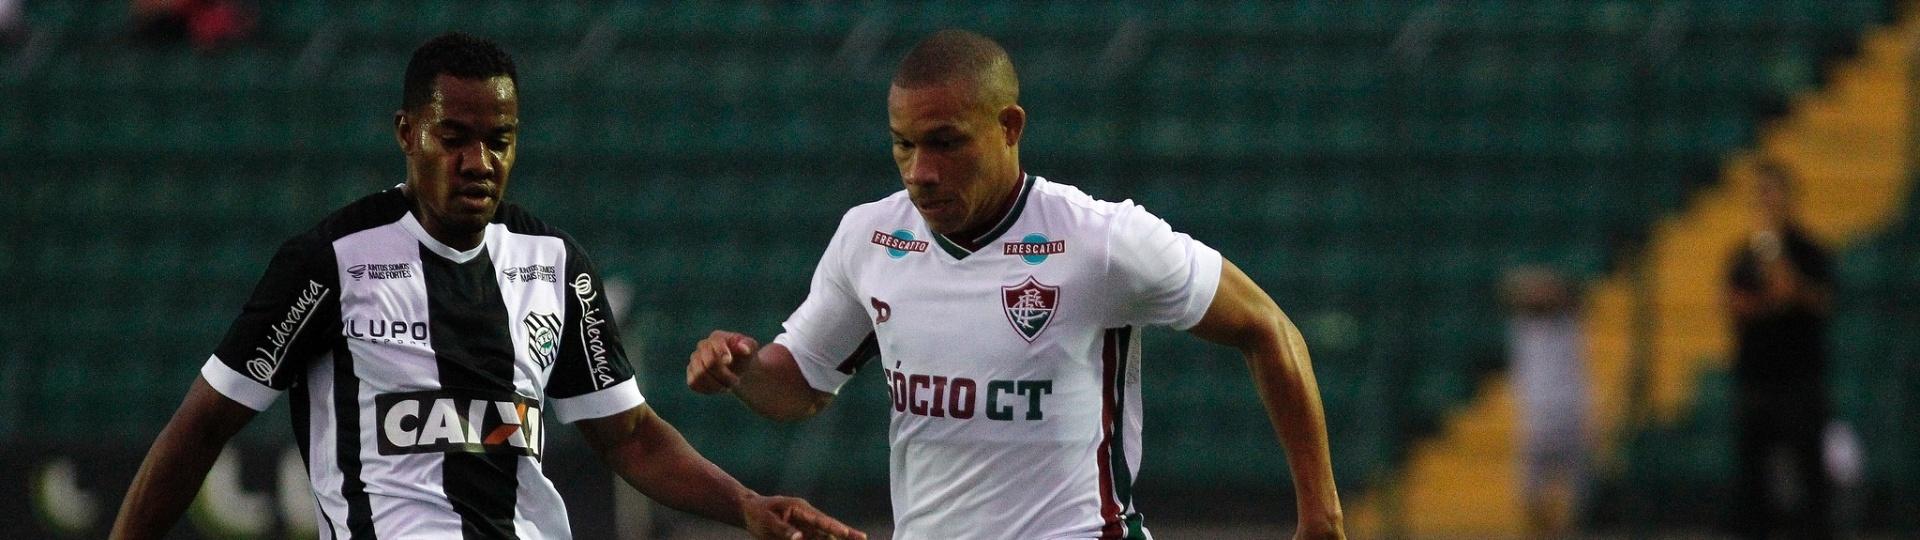 Lance do jogo entre Figueirense e Fluminense